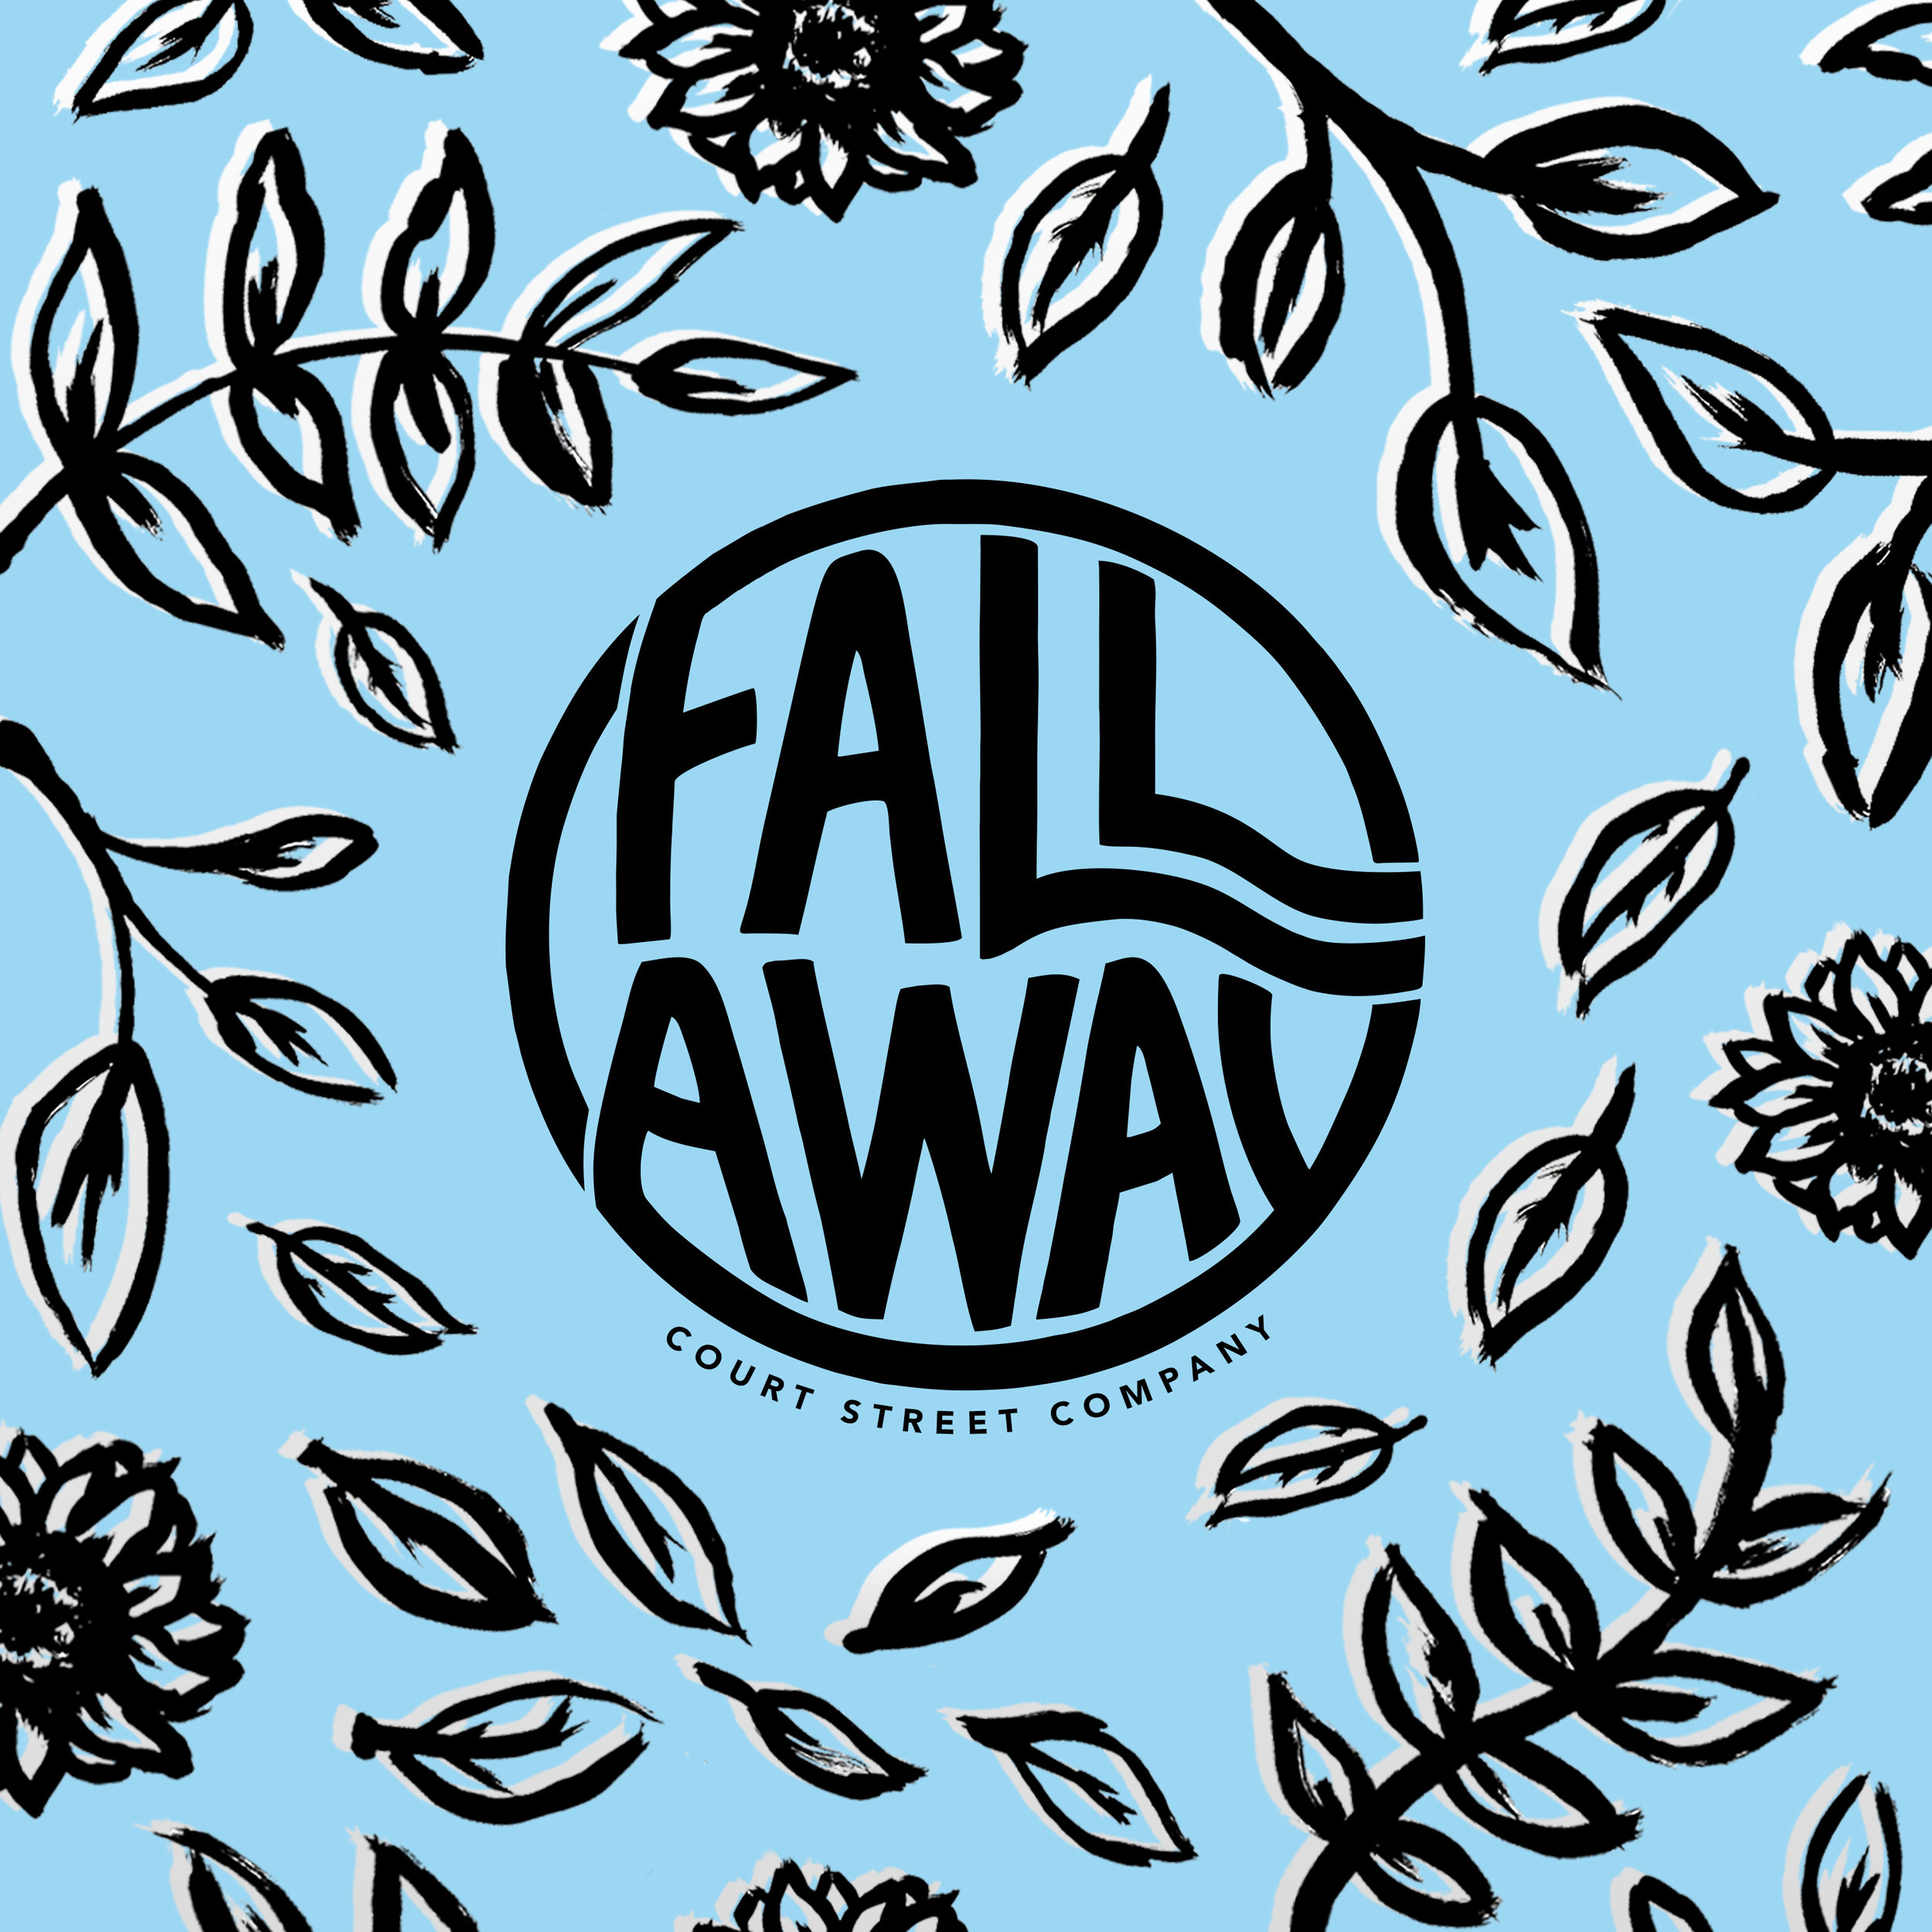 FallAwayFinal.jpg